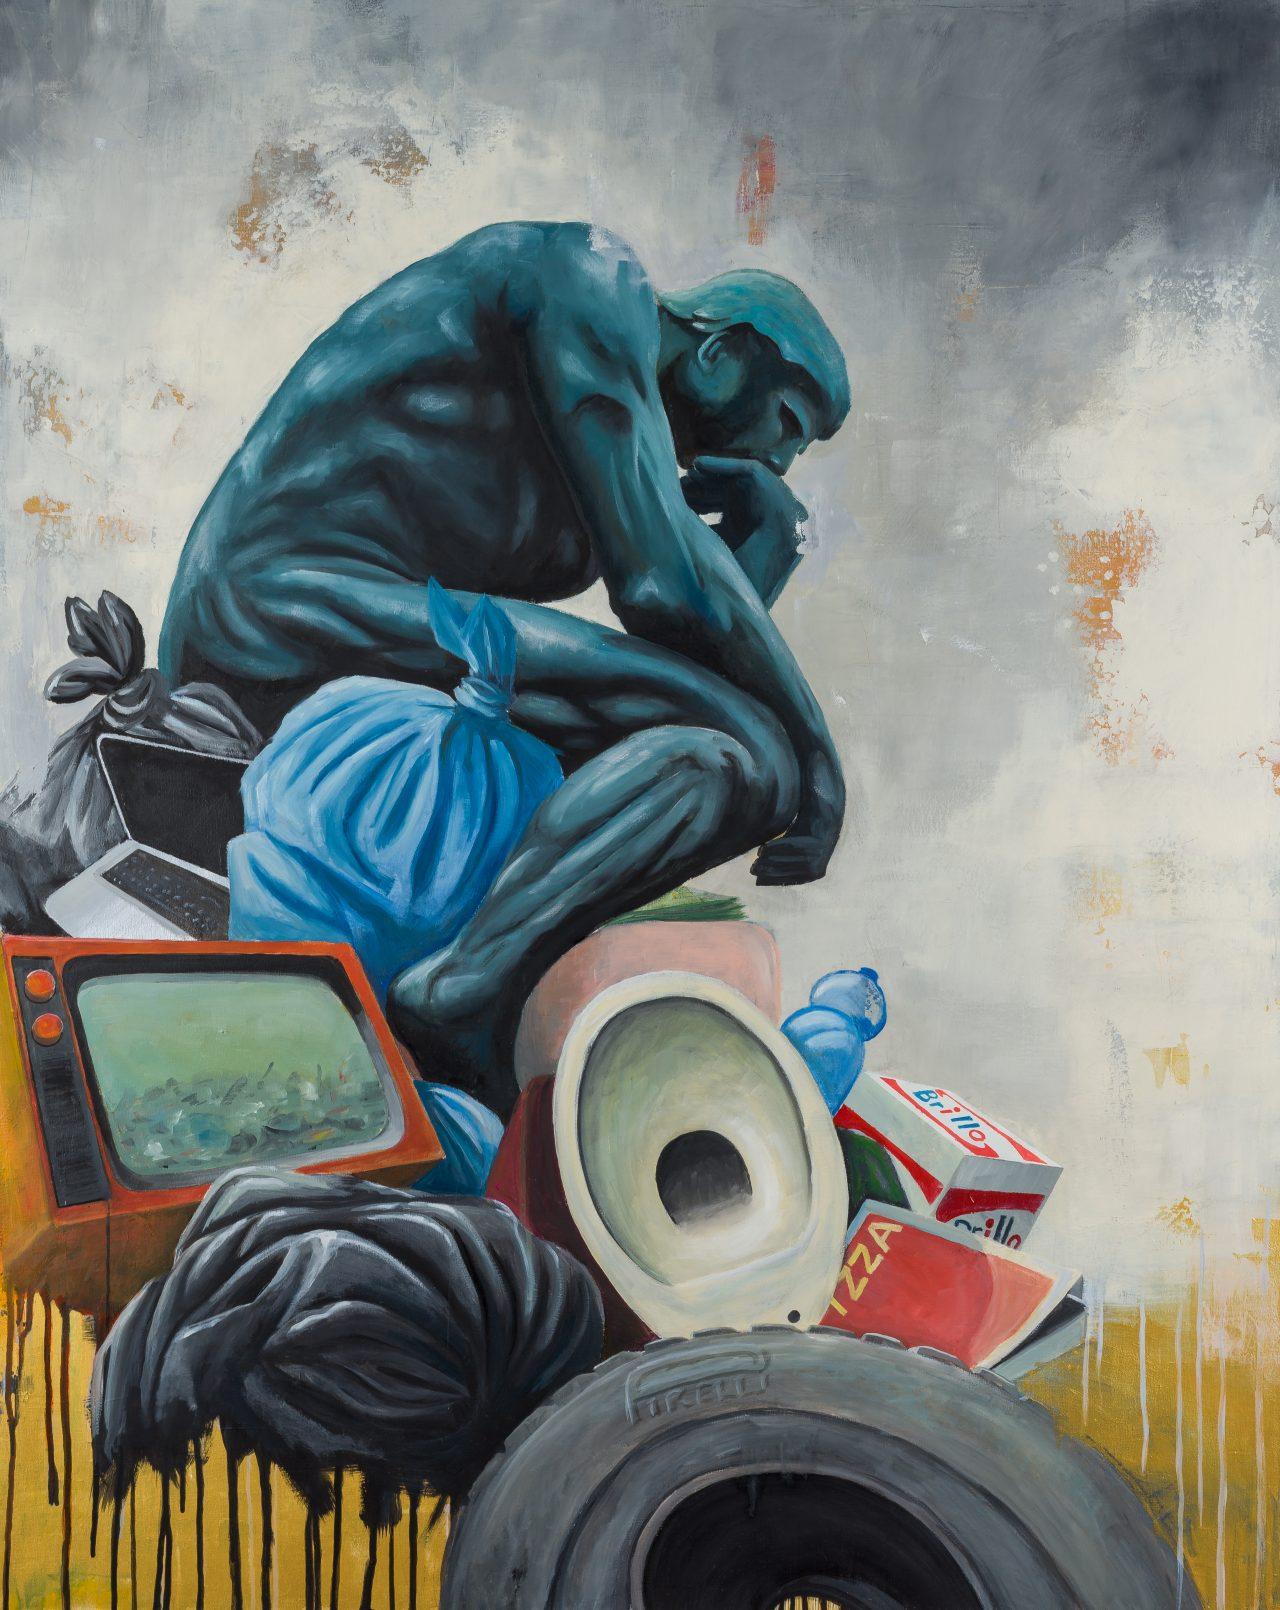 stefano-gentile-art-pop-arte-garbage-rodin-painting